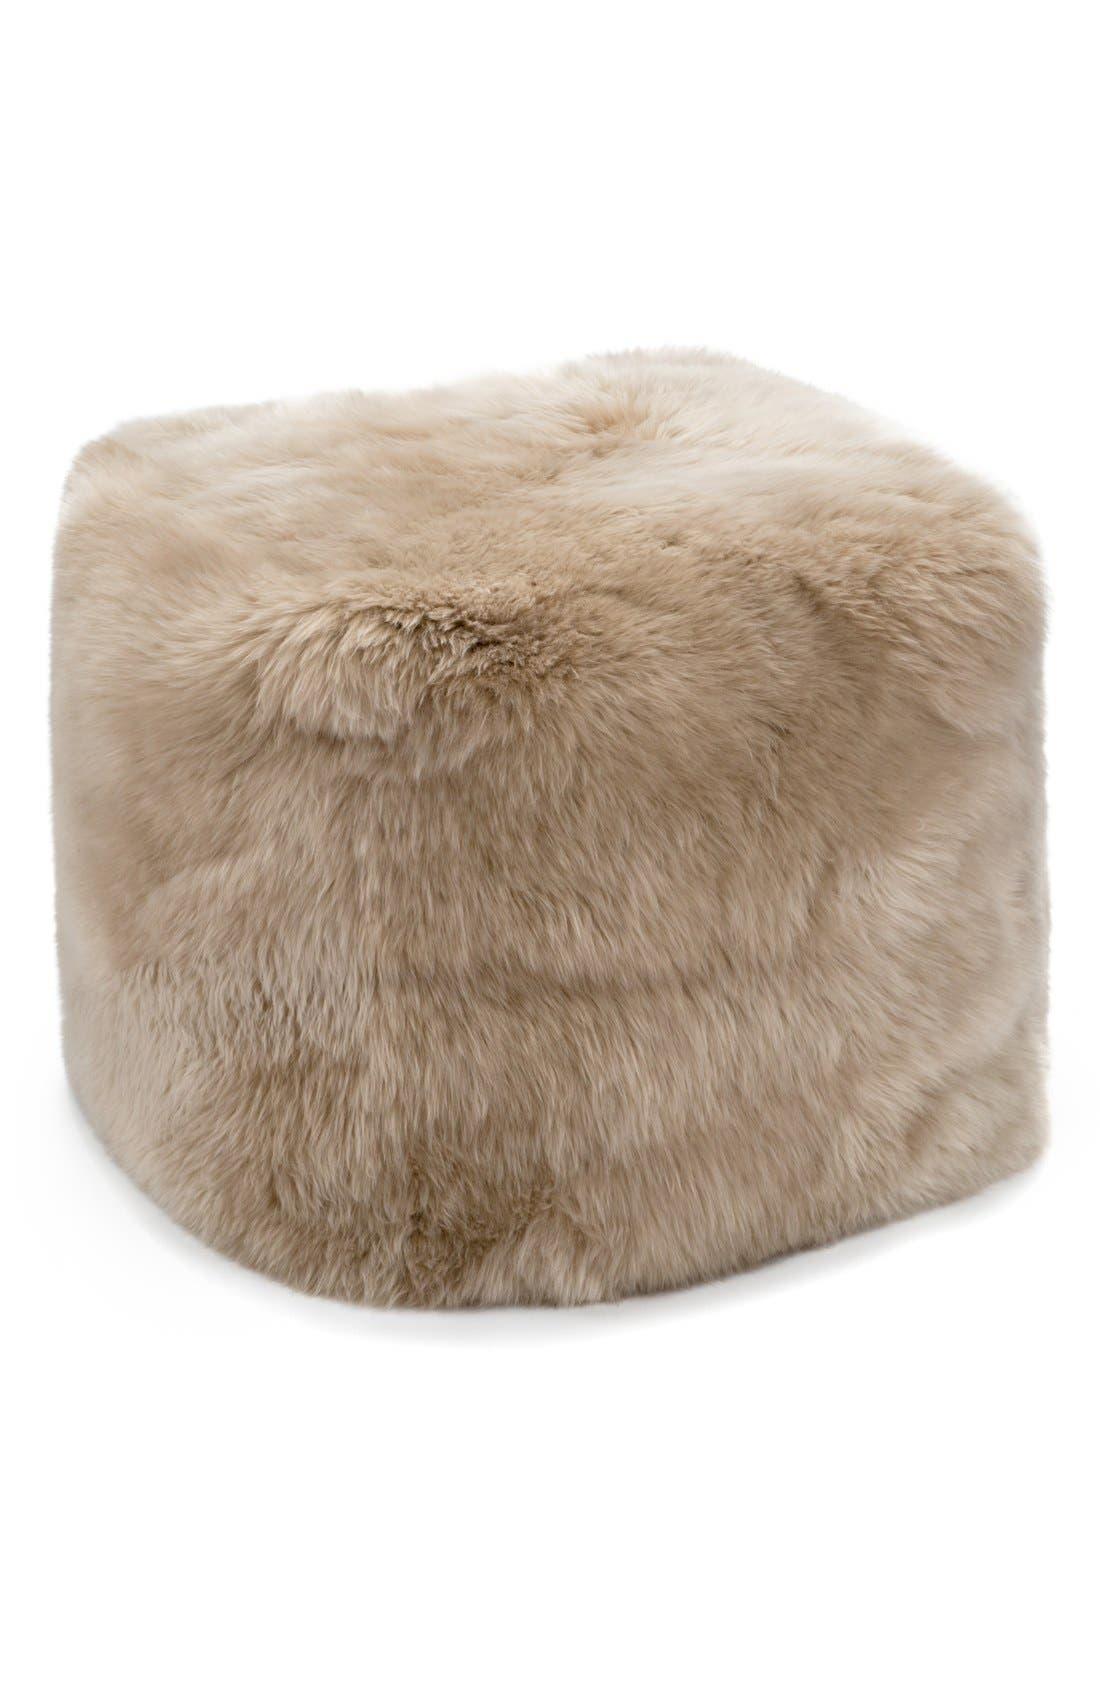 Main Image - UGG® Genuine Shearling Pouf